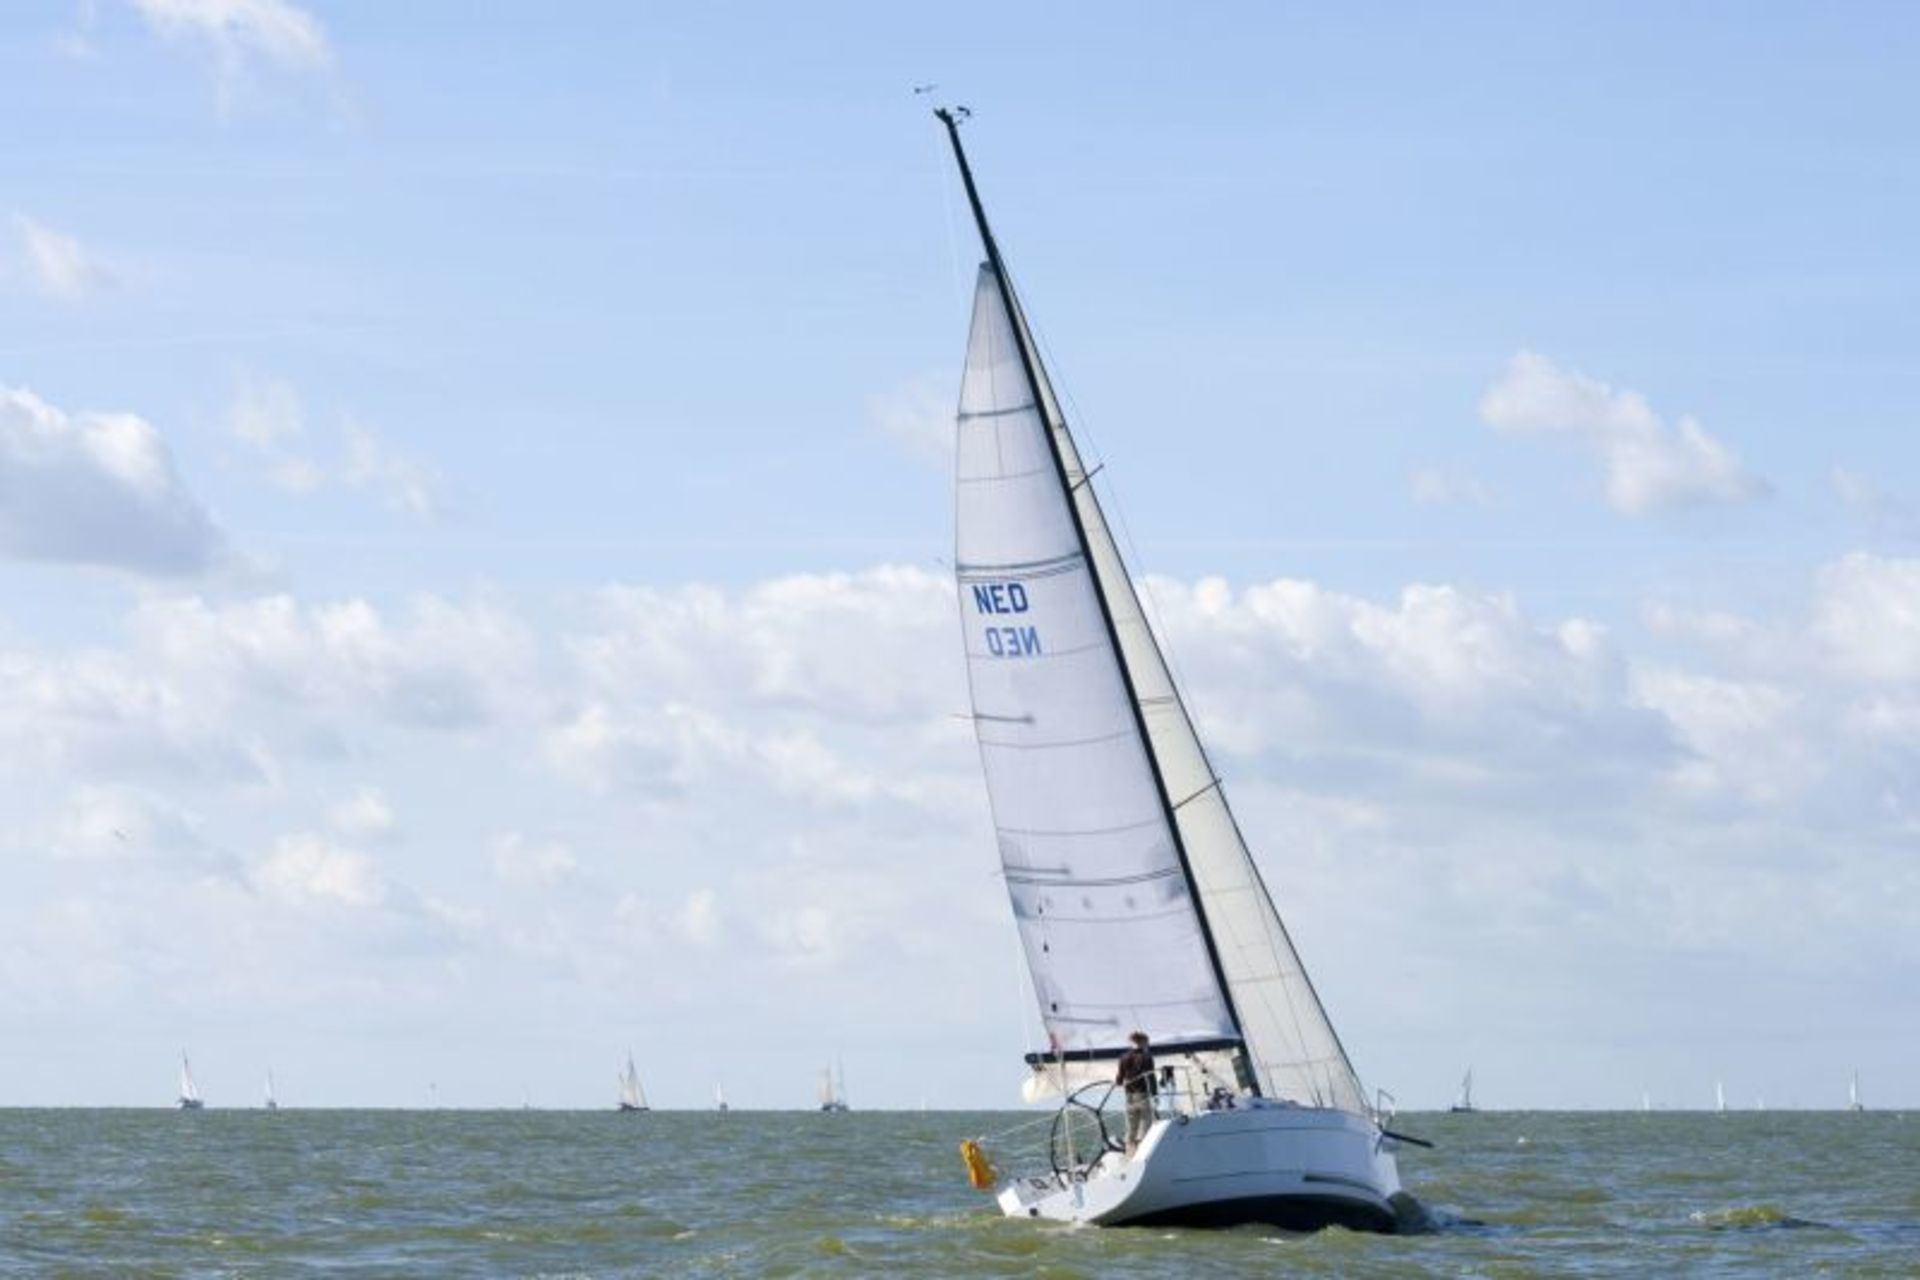 Sailing school and Beach pavilion Enkhuizen